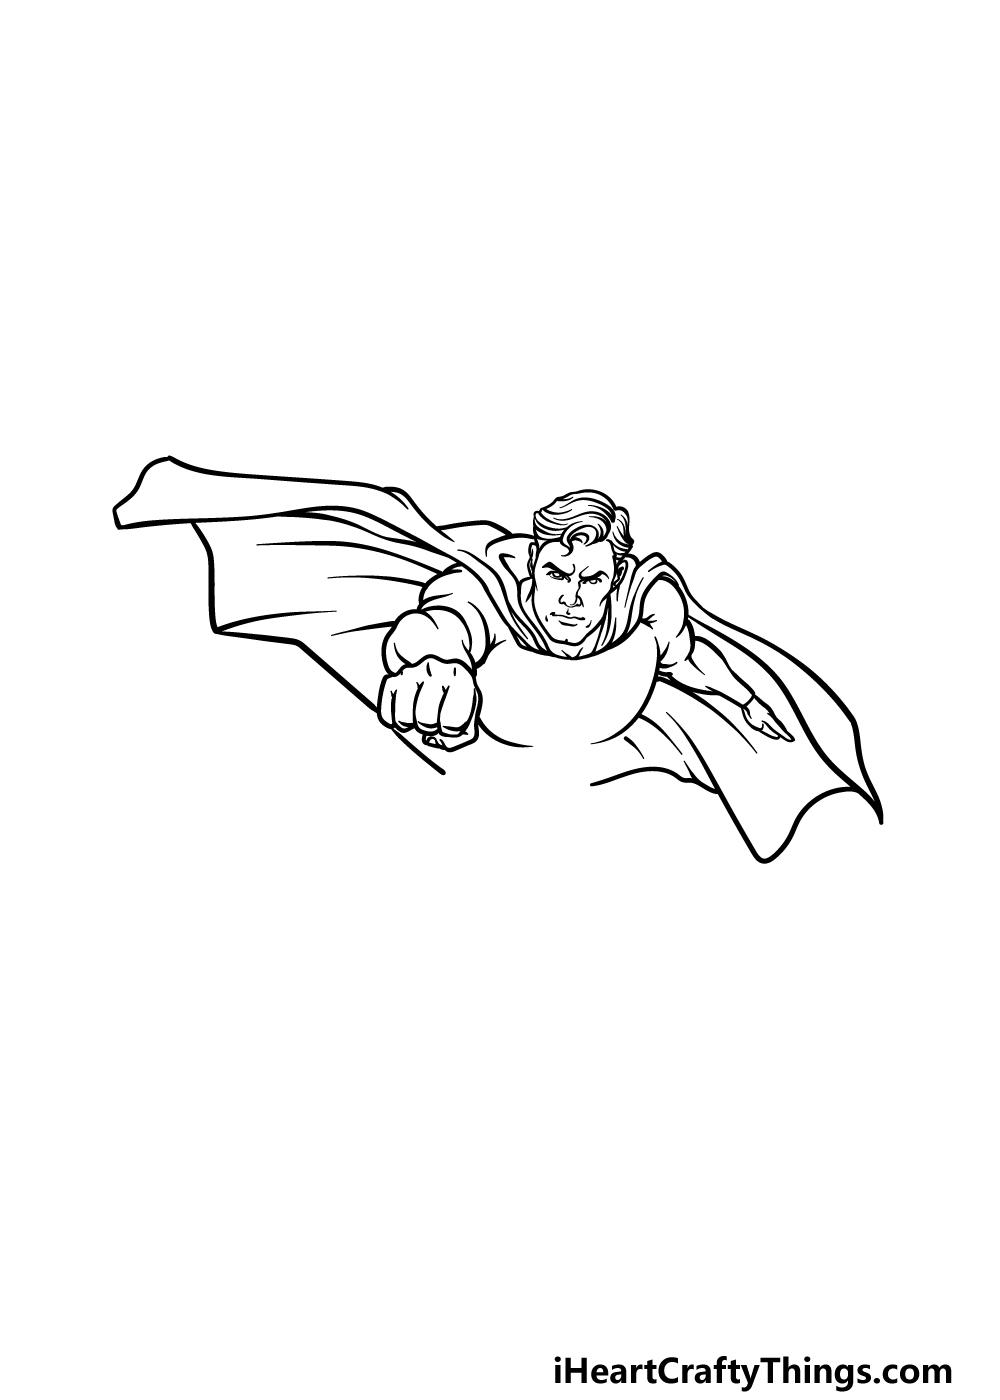 drawing Superman step 3